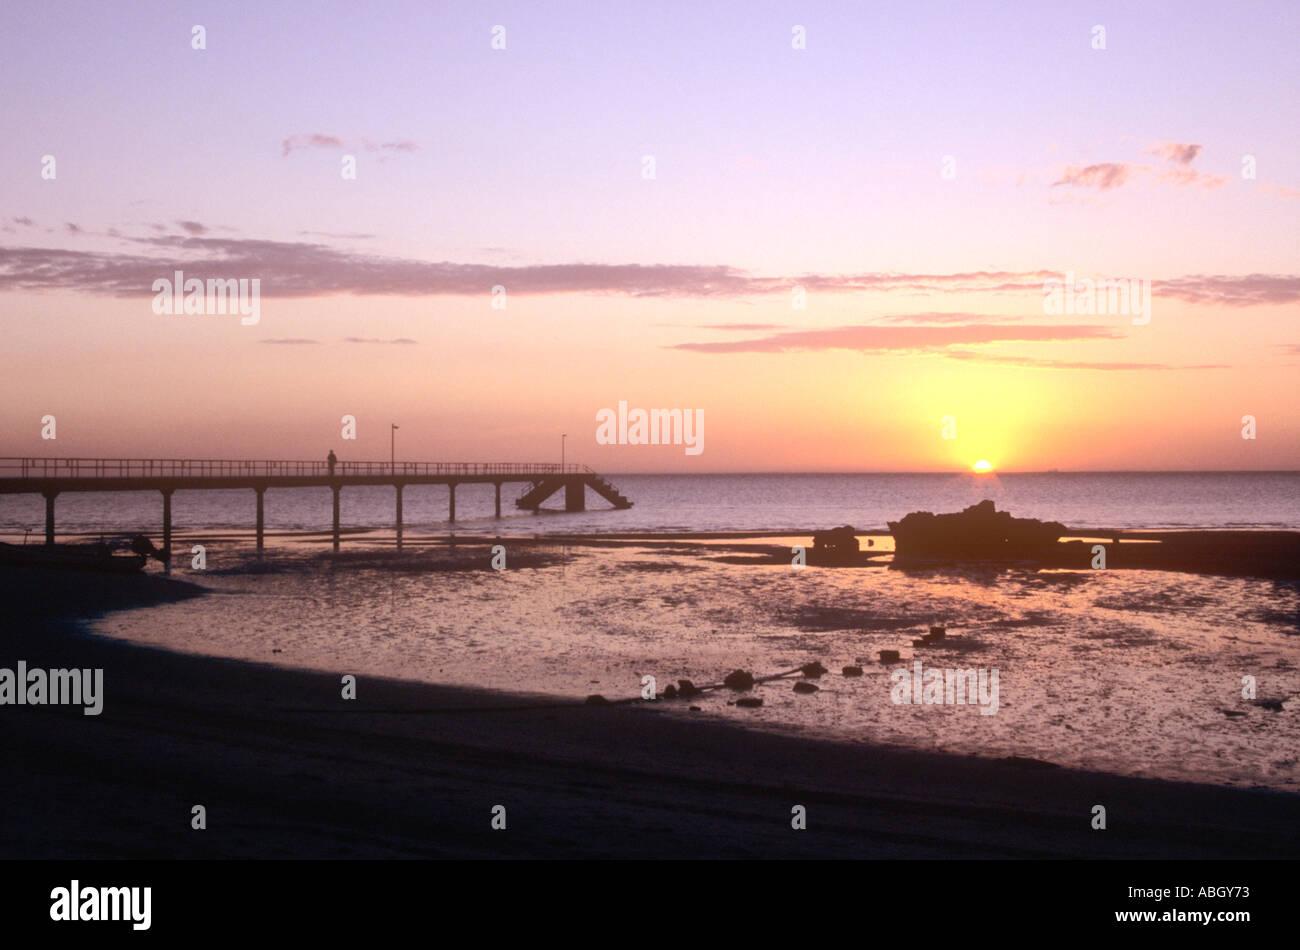 Sunset over bay of Maputo over pier on Inhaca Island near Maputo, Mozambique Stock Photo